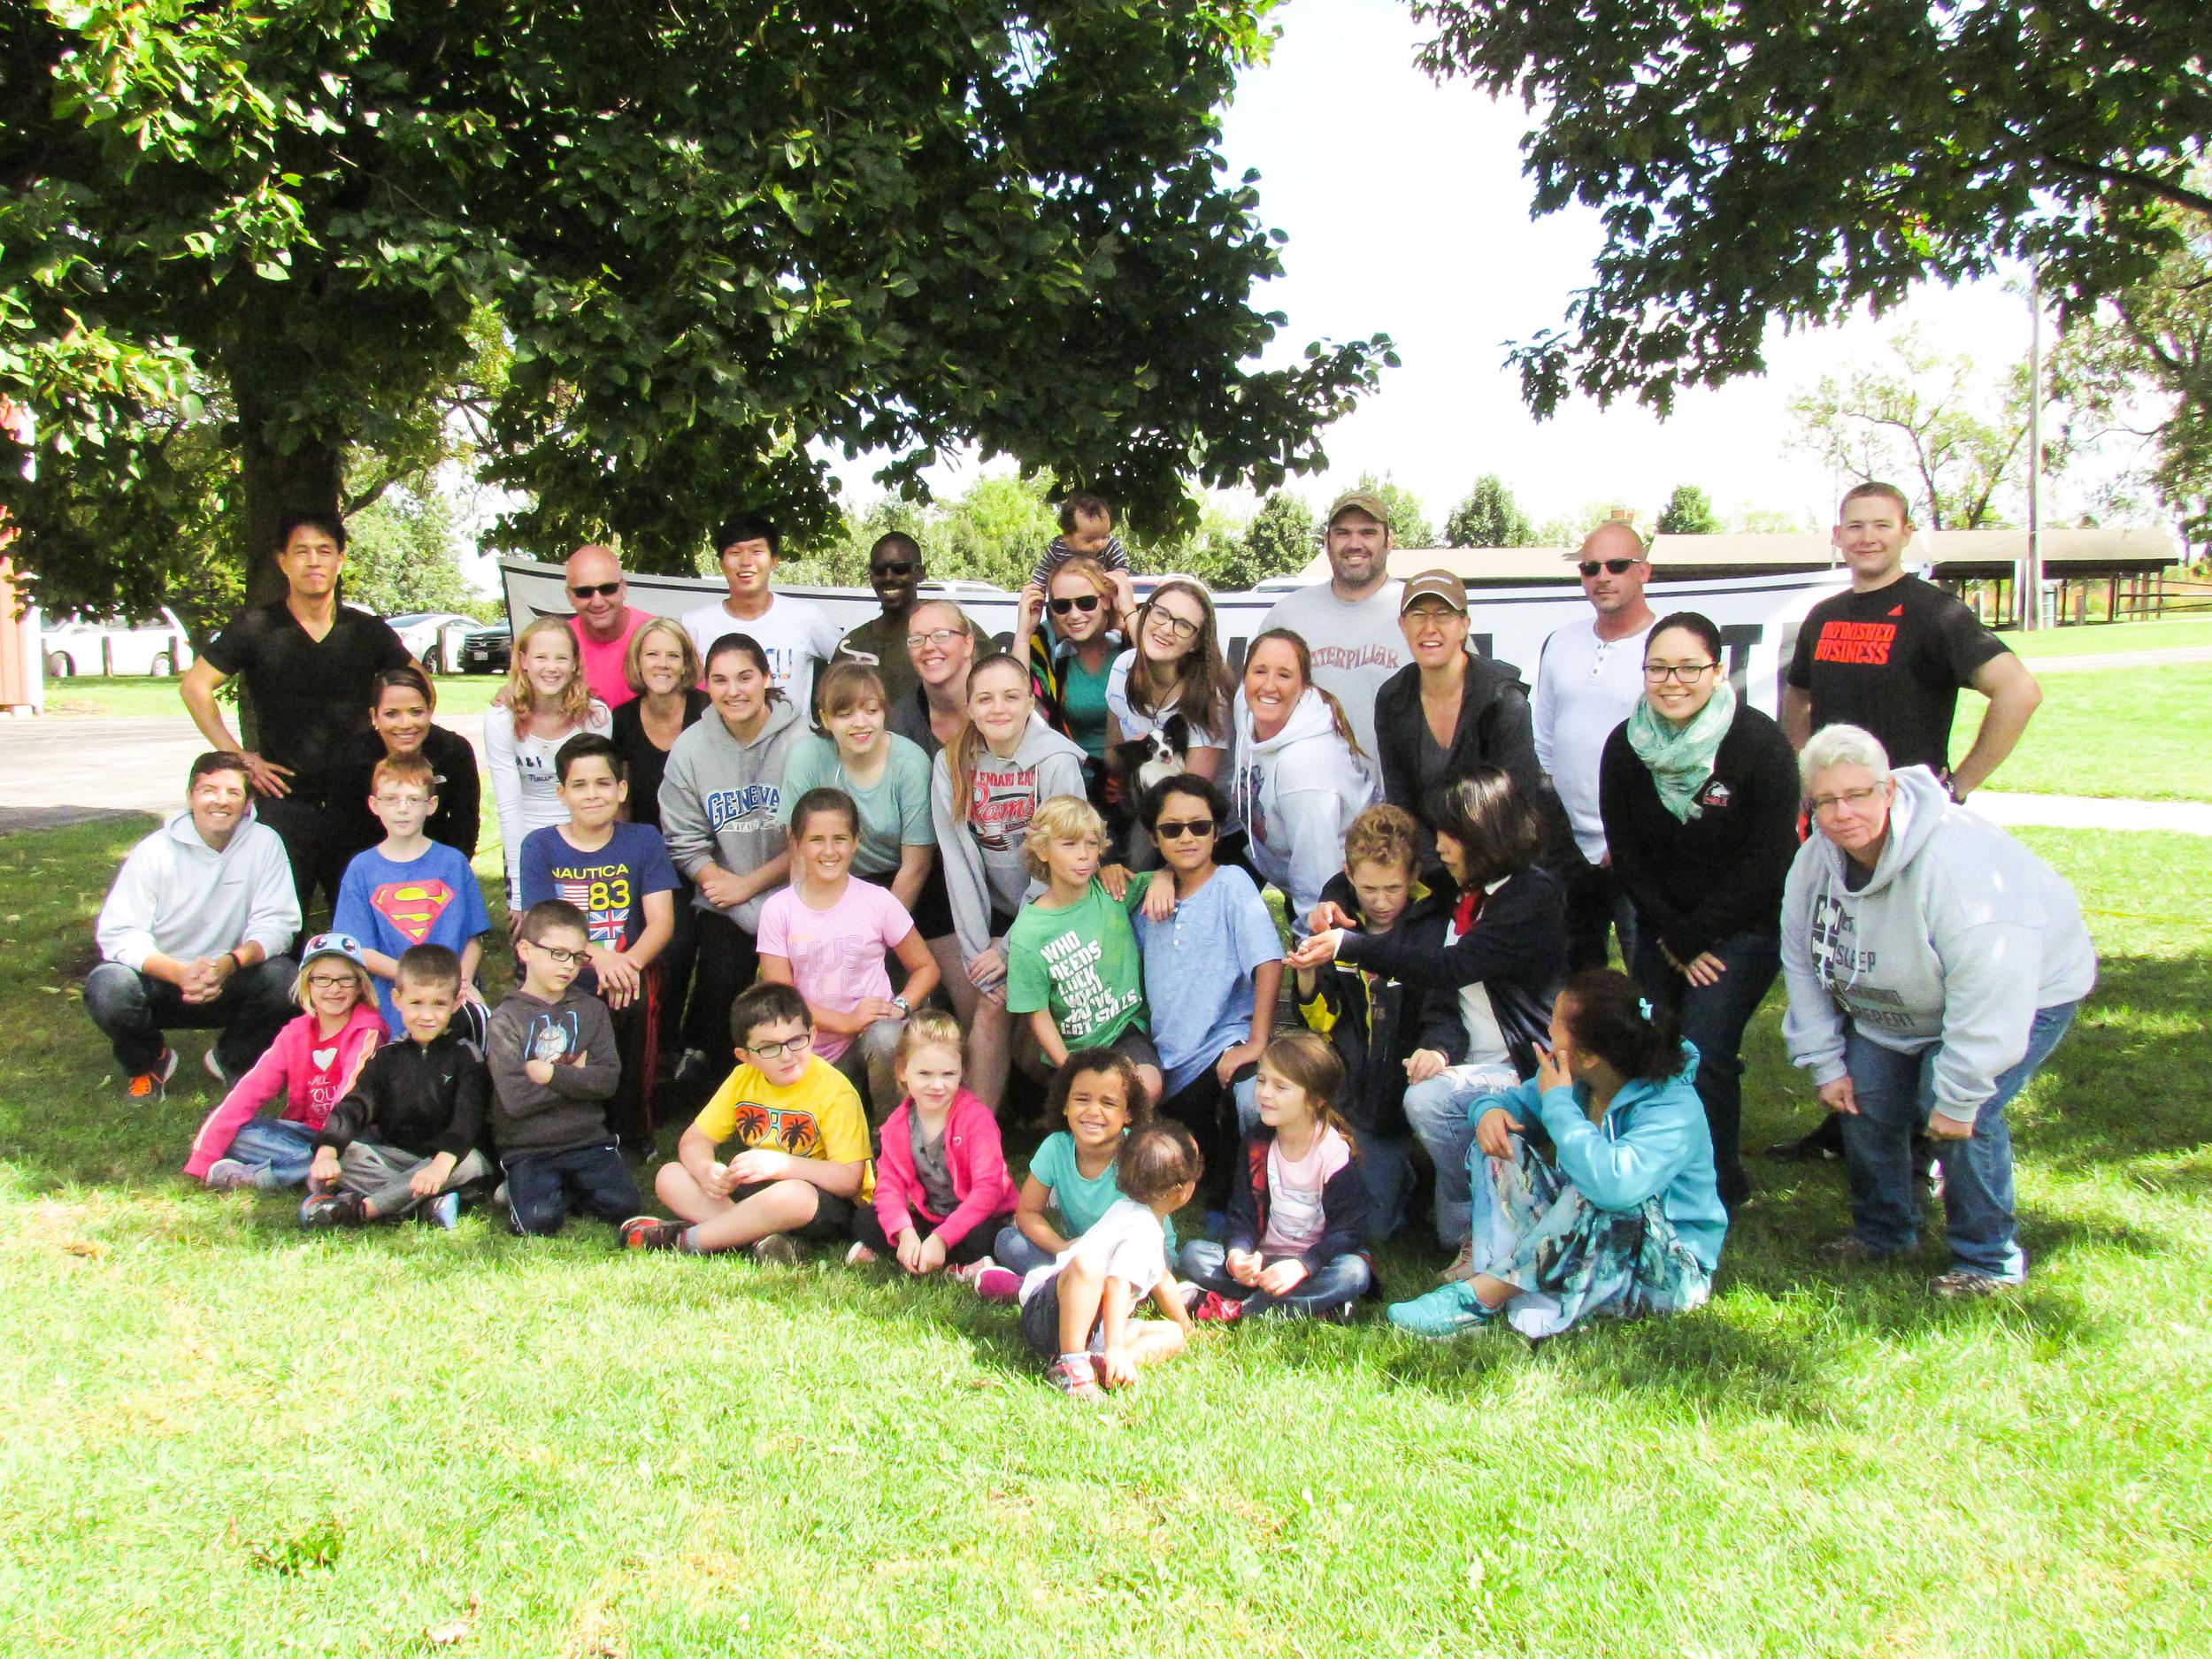 2015.09.19 TKC picnic (75).jpg